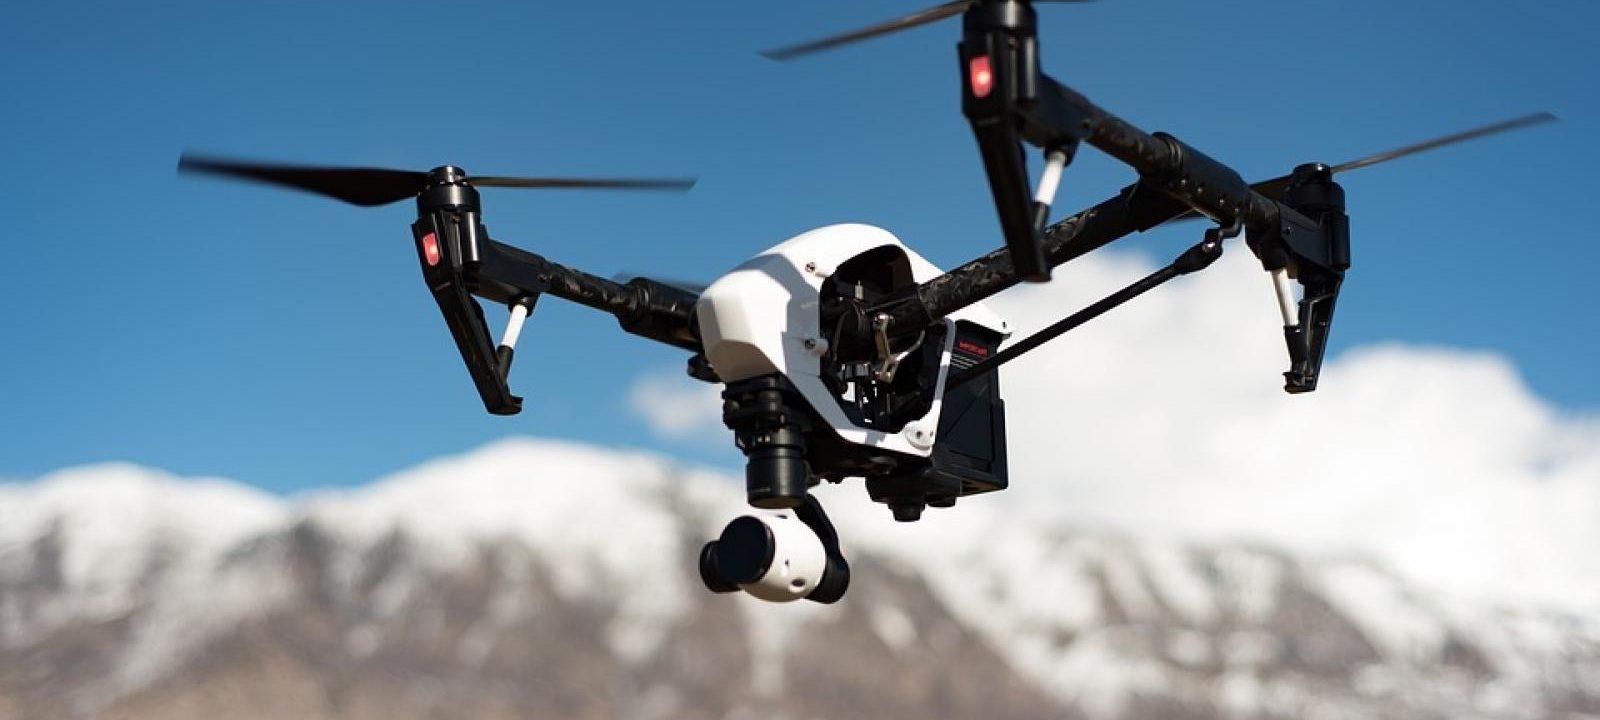 industri 5.0. droner robotter foredrag nye teknologier